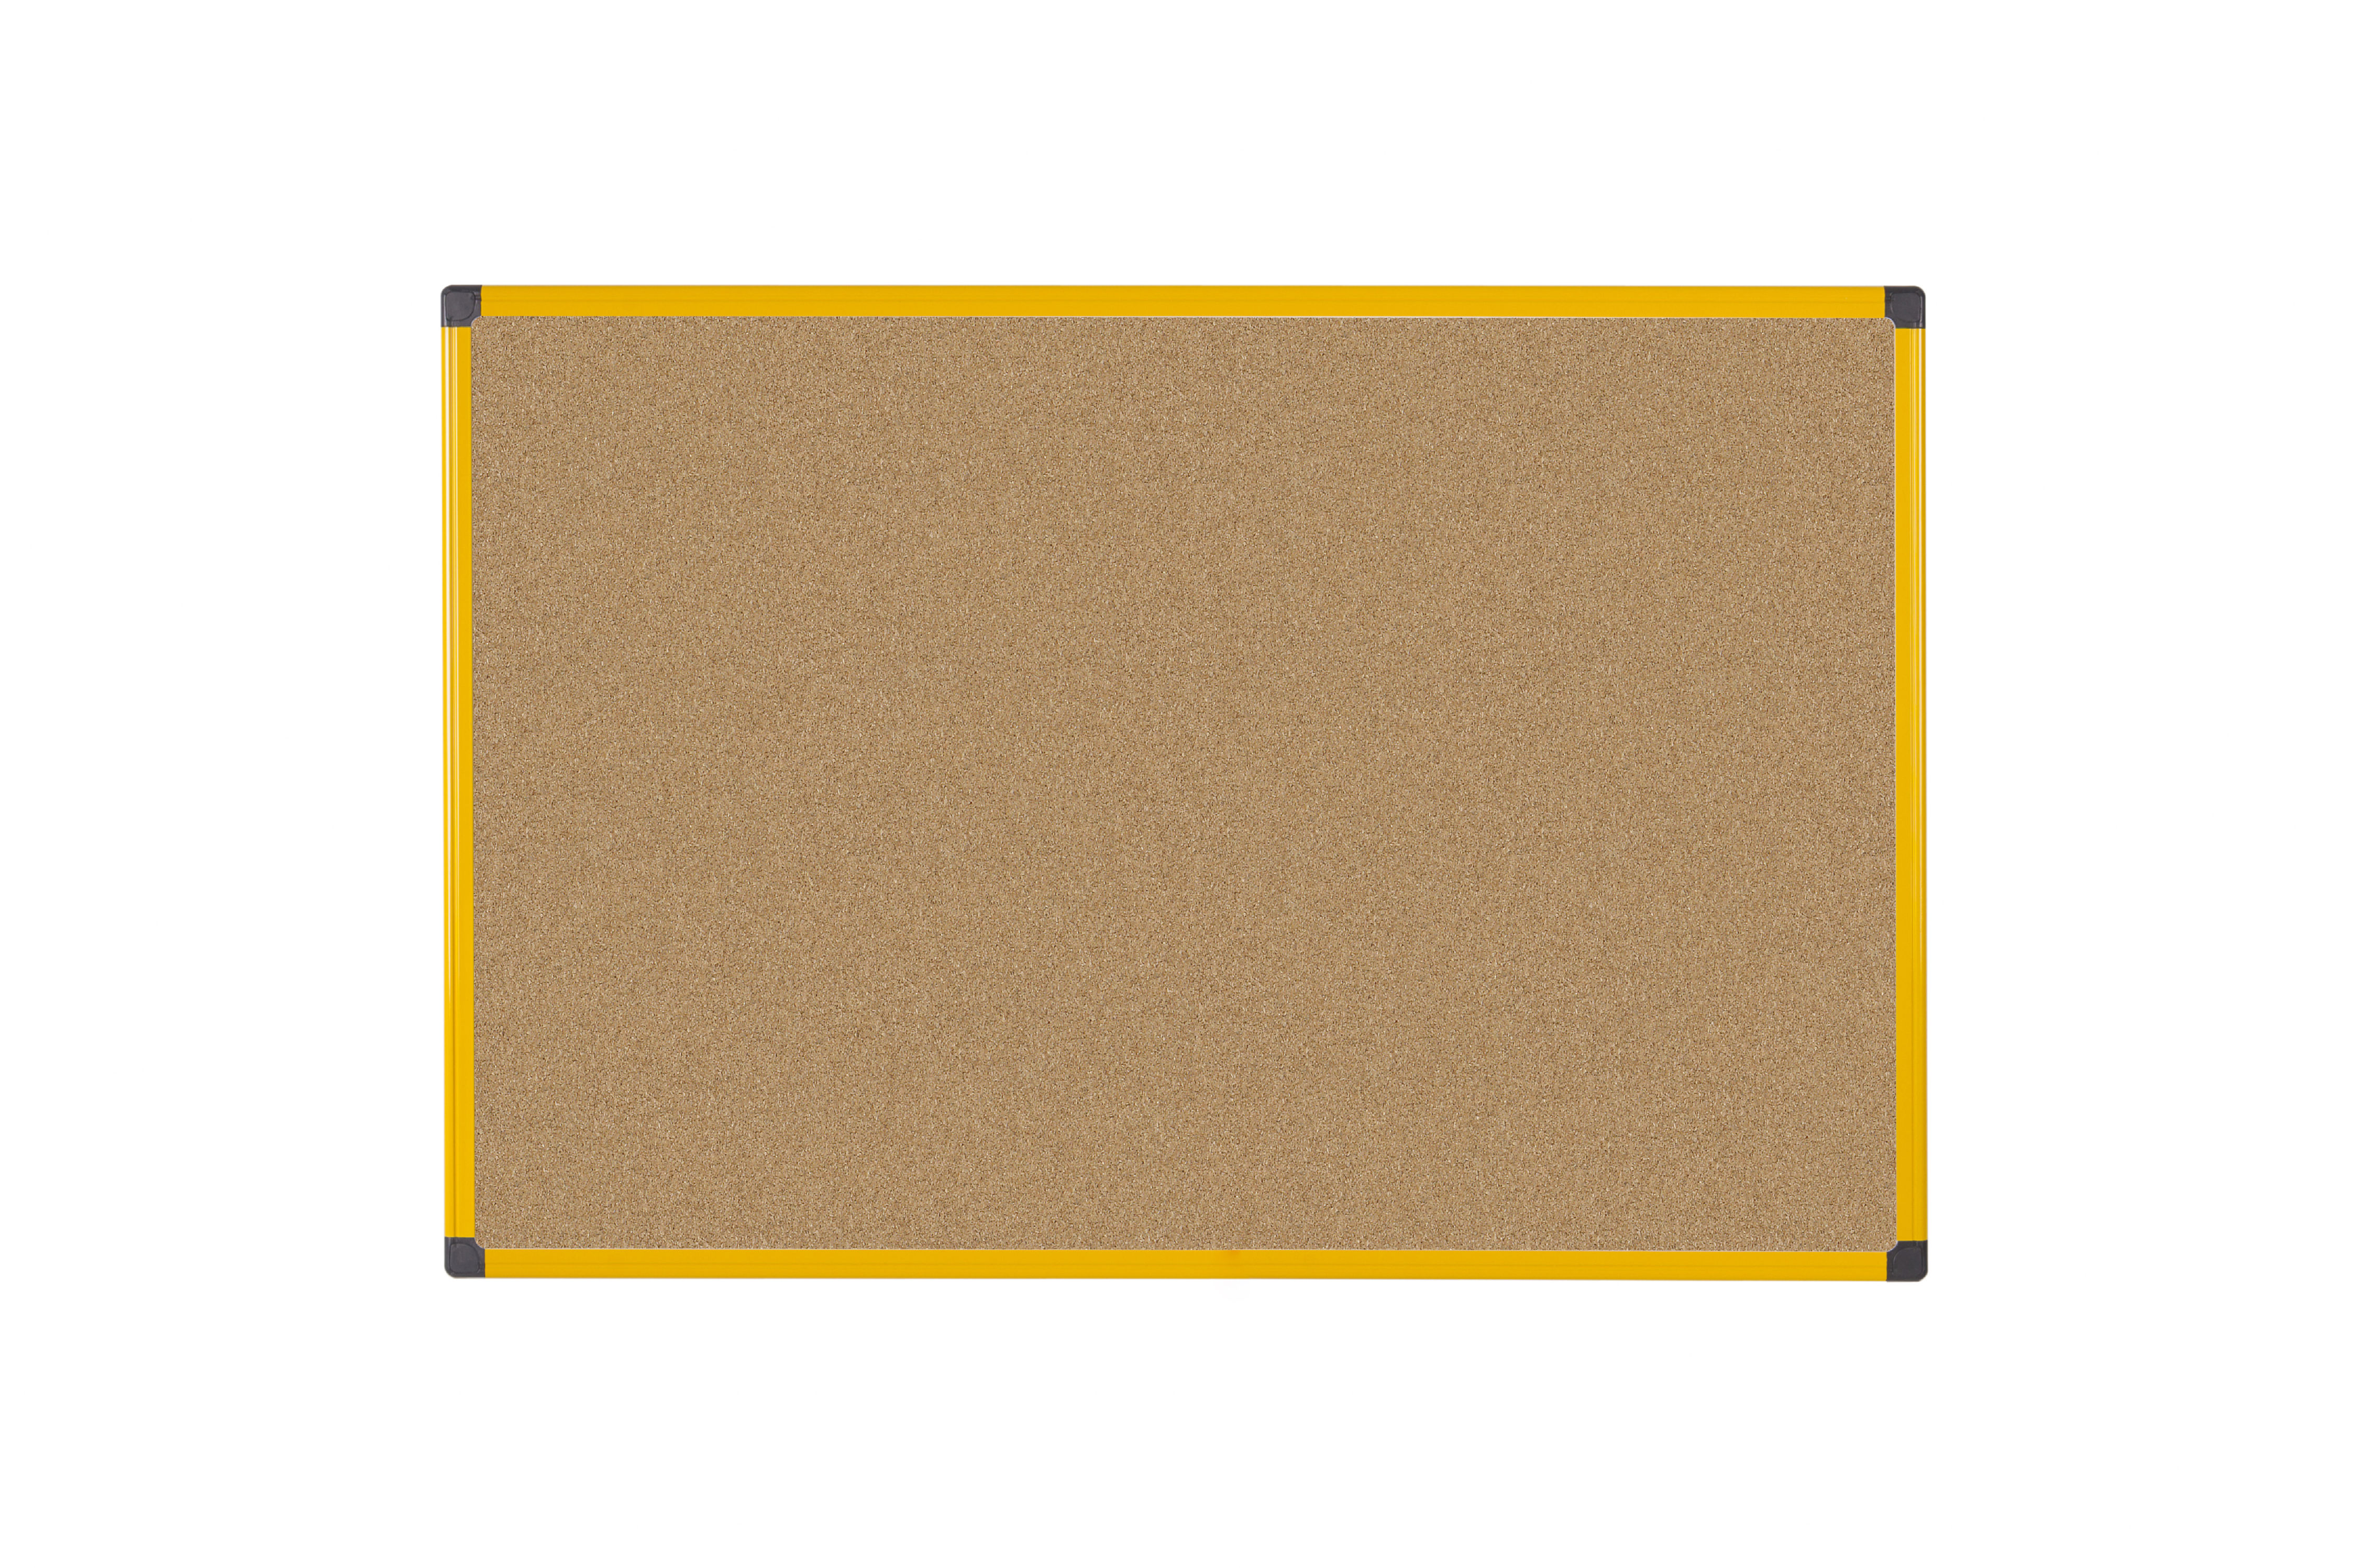 Cork Bi-Office Ultrabrite Cork Noticeboard Yellow Aluminium Frame 1200x900mm